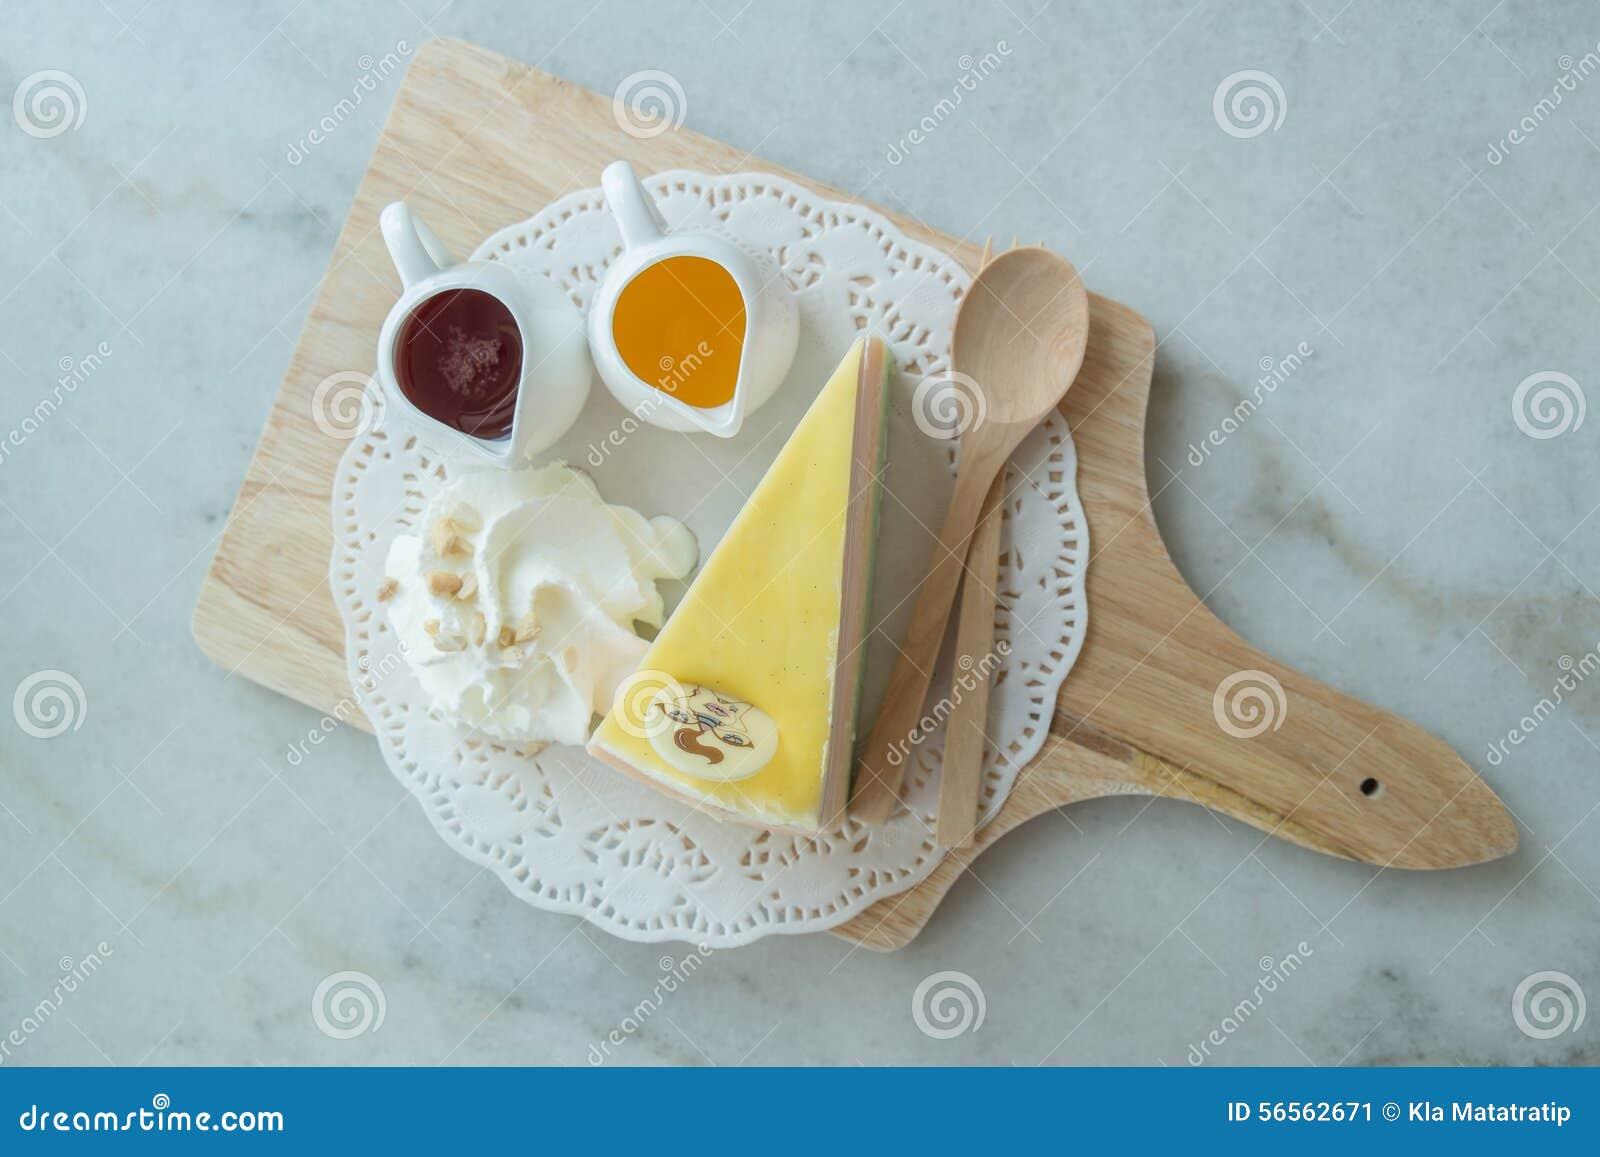 Download Το ουράνιο τόξο Crepe το κέικ στο Mable πίνακα Στοκ Εικόνα - εικόνα από επιδόρπιο, closeup: 56562671